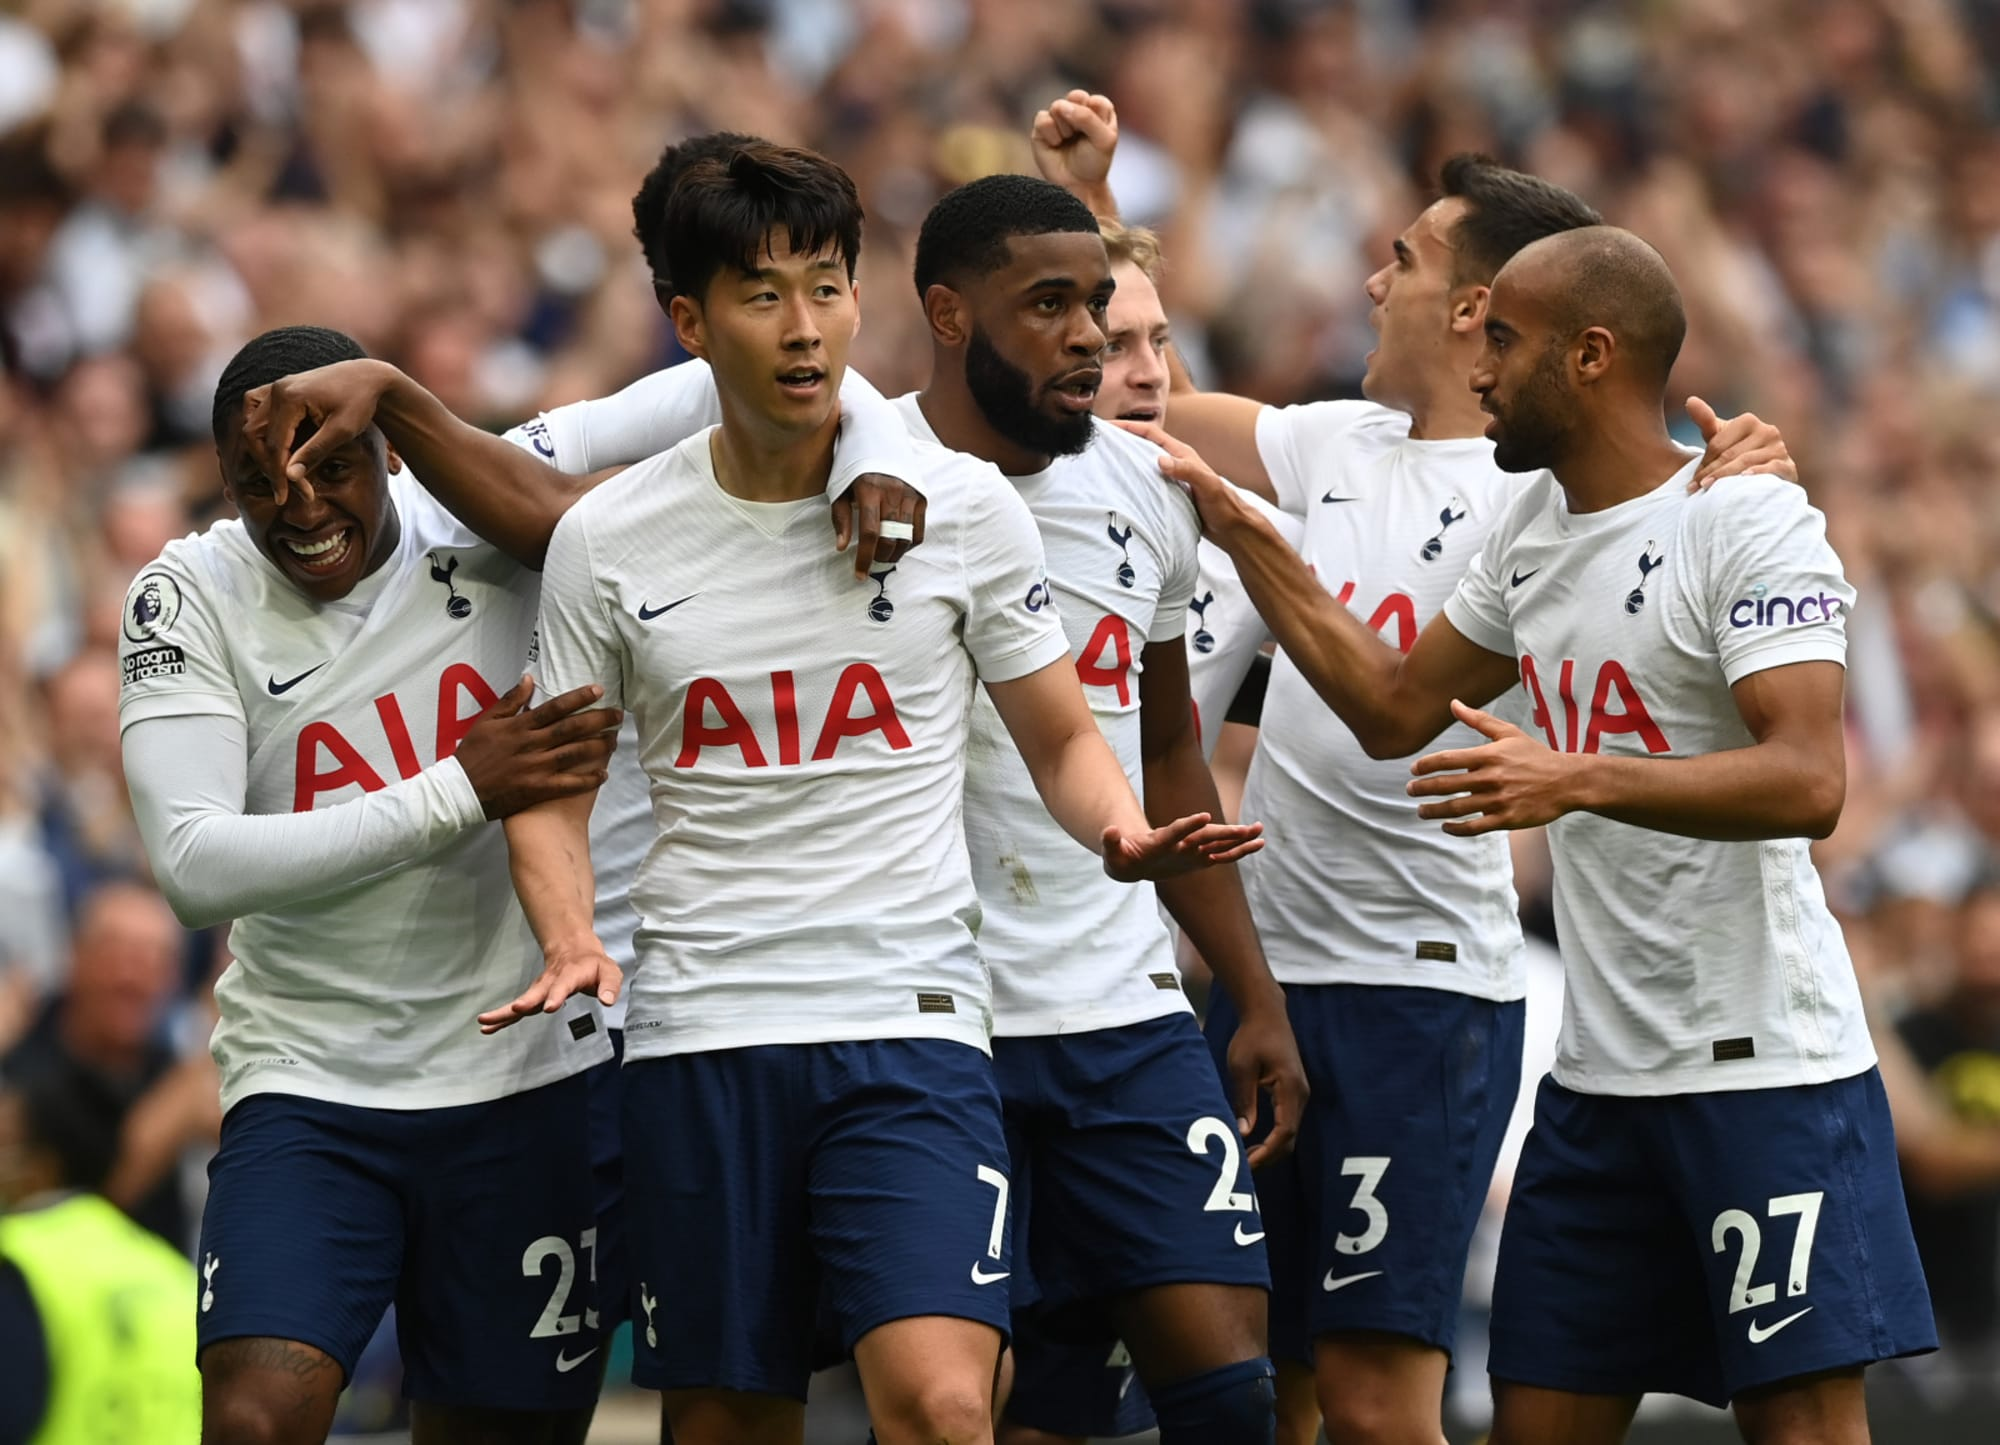 Arsenal Vs Tottenham Hotspur Match Time, Date, Predictions, Live Stream